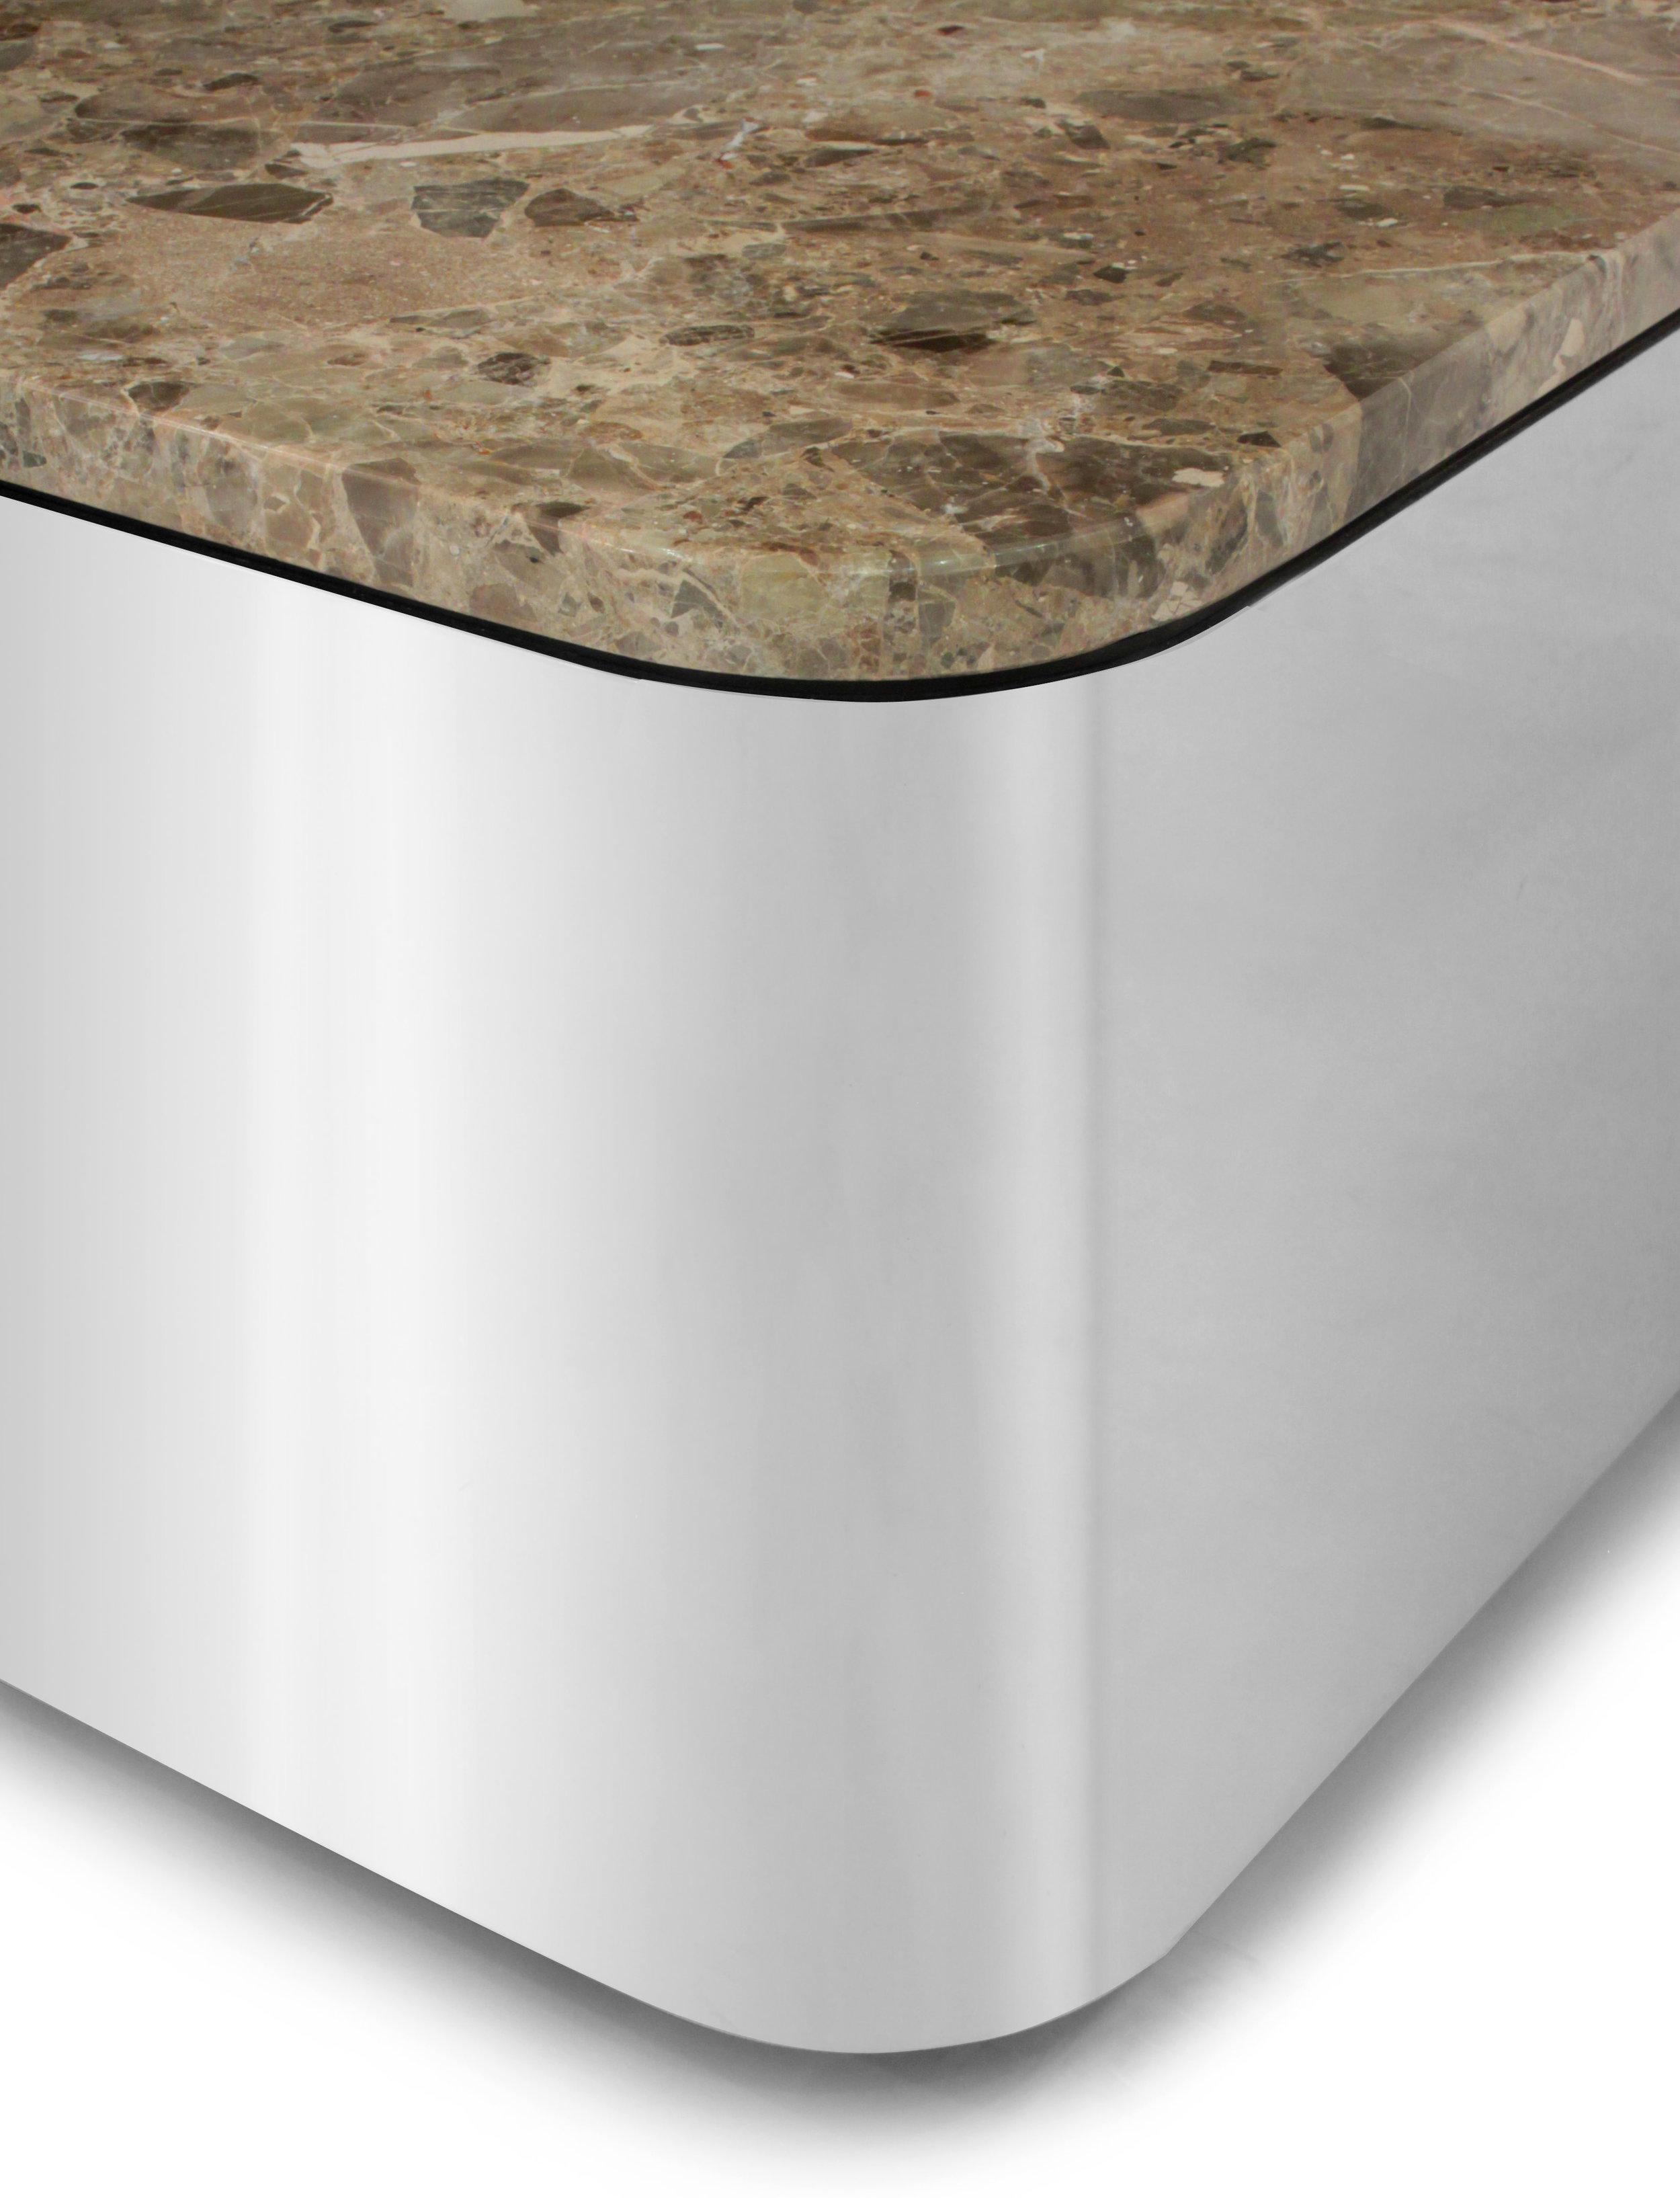 Brueton 85 polished steel+marble coffeetable75 detail1 hires.jpg